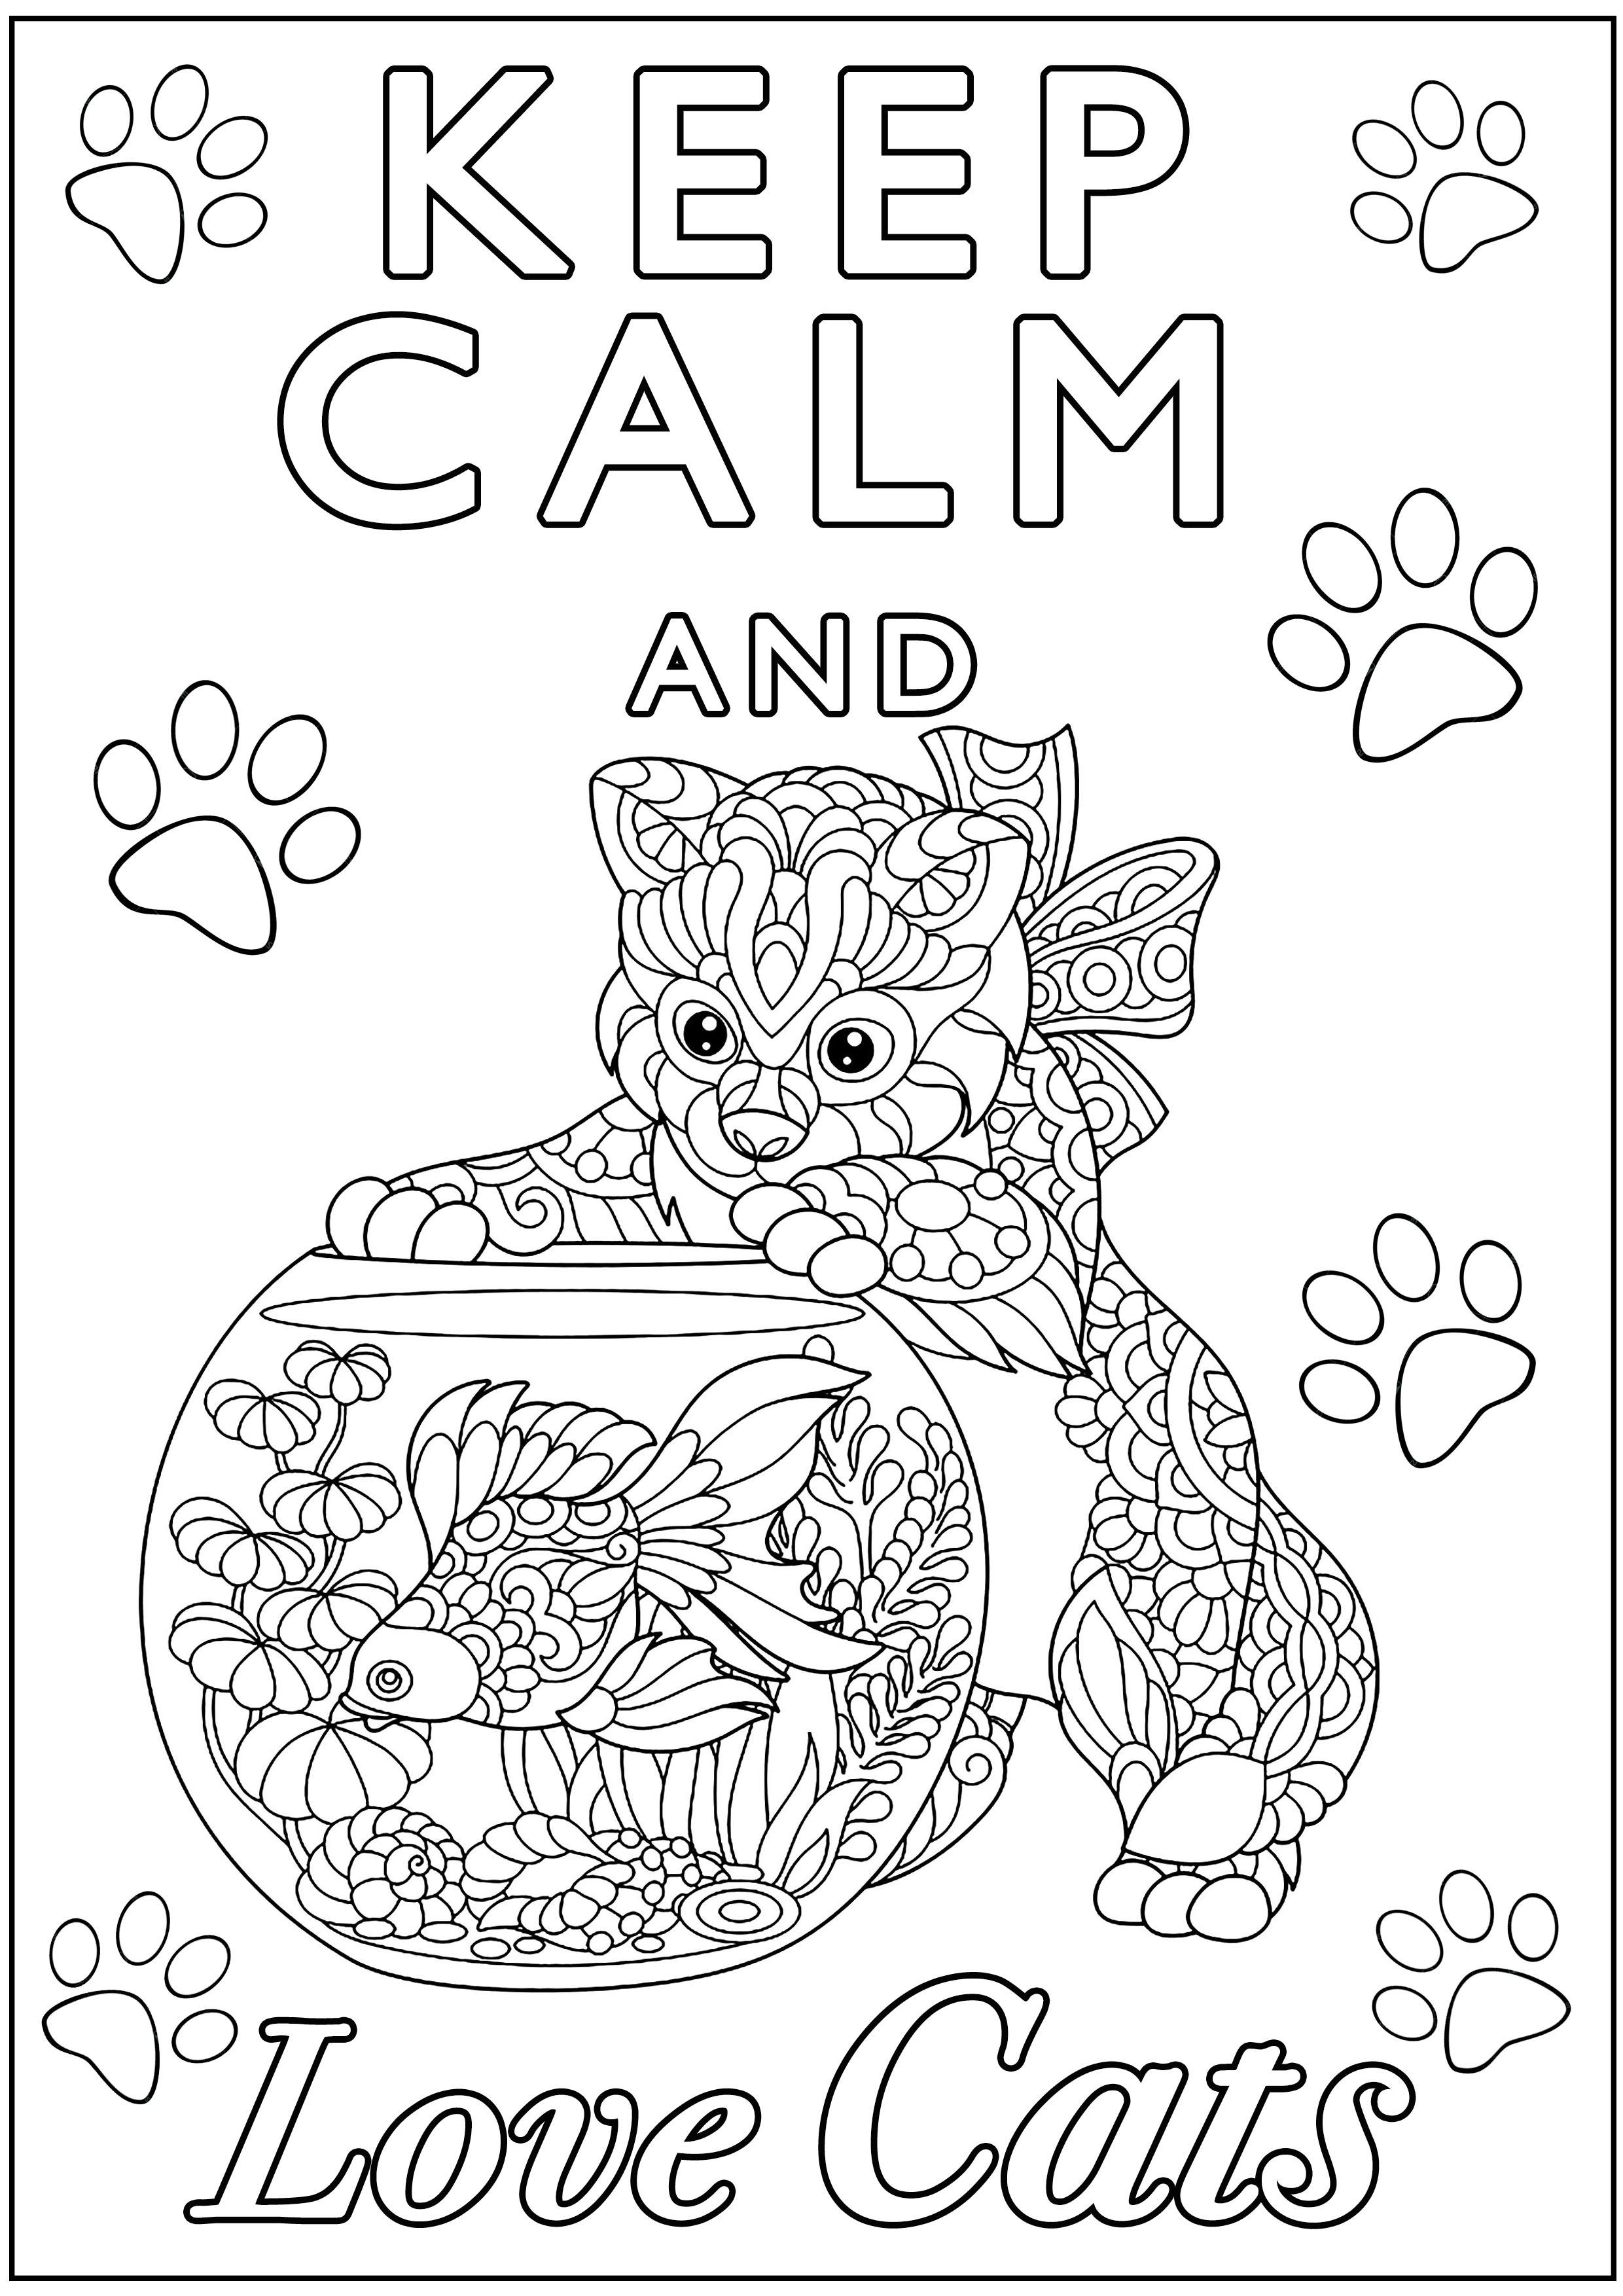 Disegni da Colorare per Adulti : Keep Calm - 1